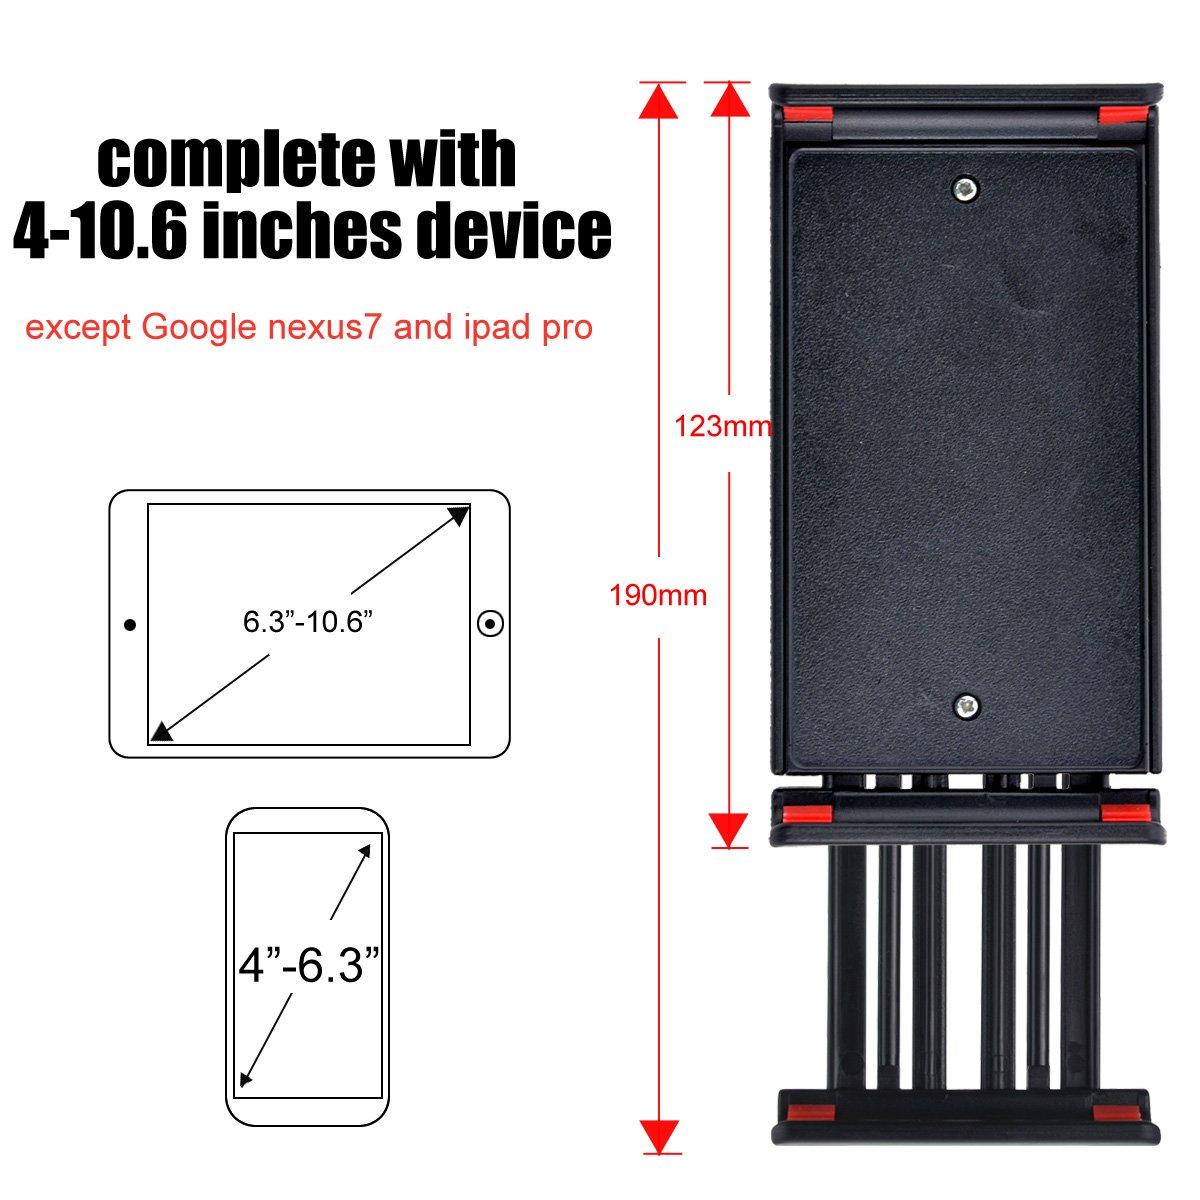 MOACC 360 Adjustable Gooseneck Tablet Phone Stand Cell Phone Holder(Black)